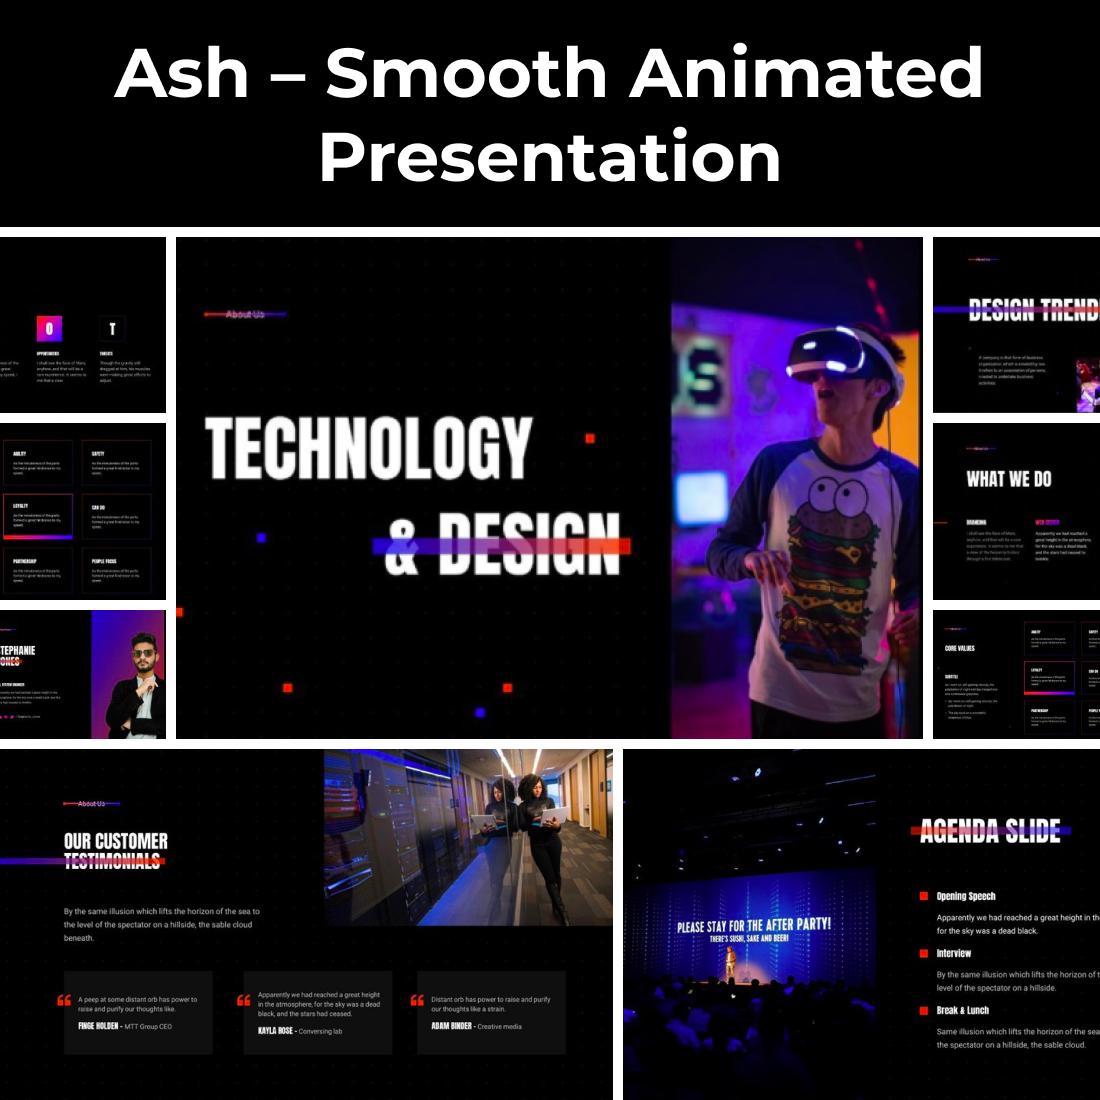 5 Ash – Smooth Animated Presentation